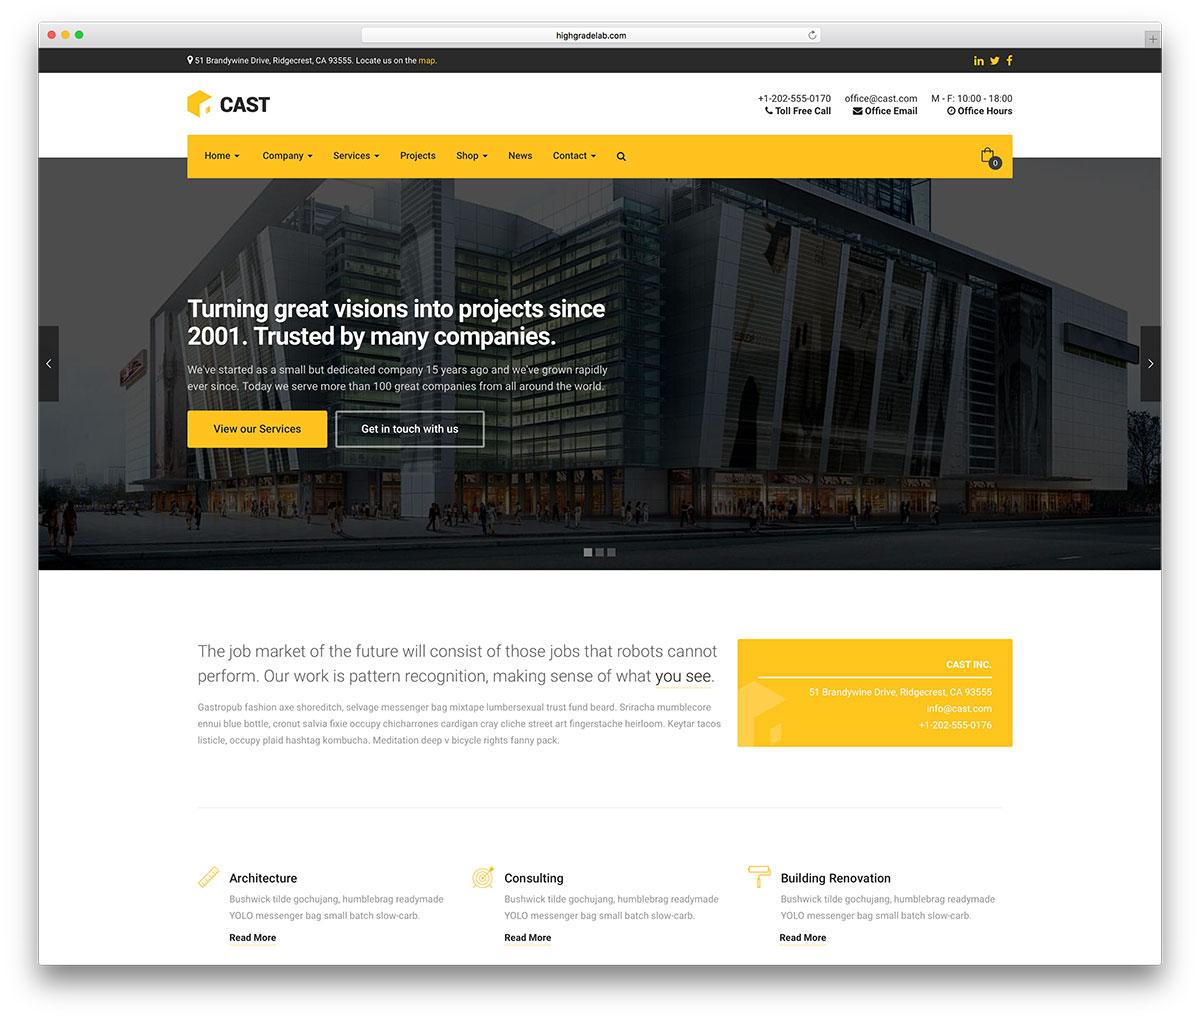 46 Best Construction Company Wordpress Themes 2018   Colorlib With Company Templates Company Templates Expense Spreadshee Expense Spreadshee company templates word